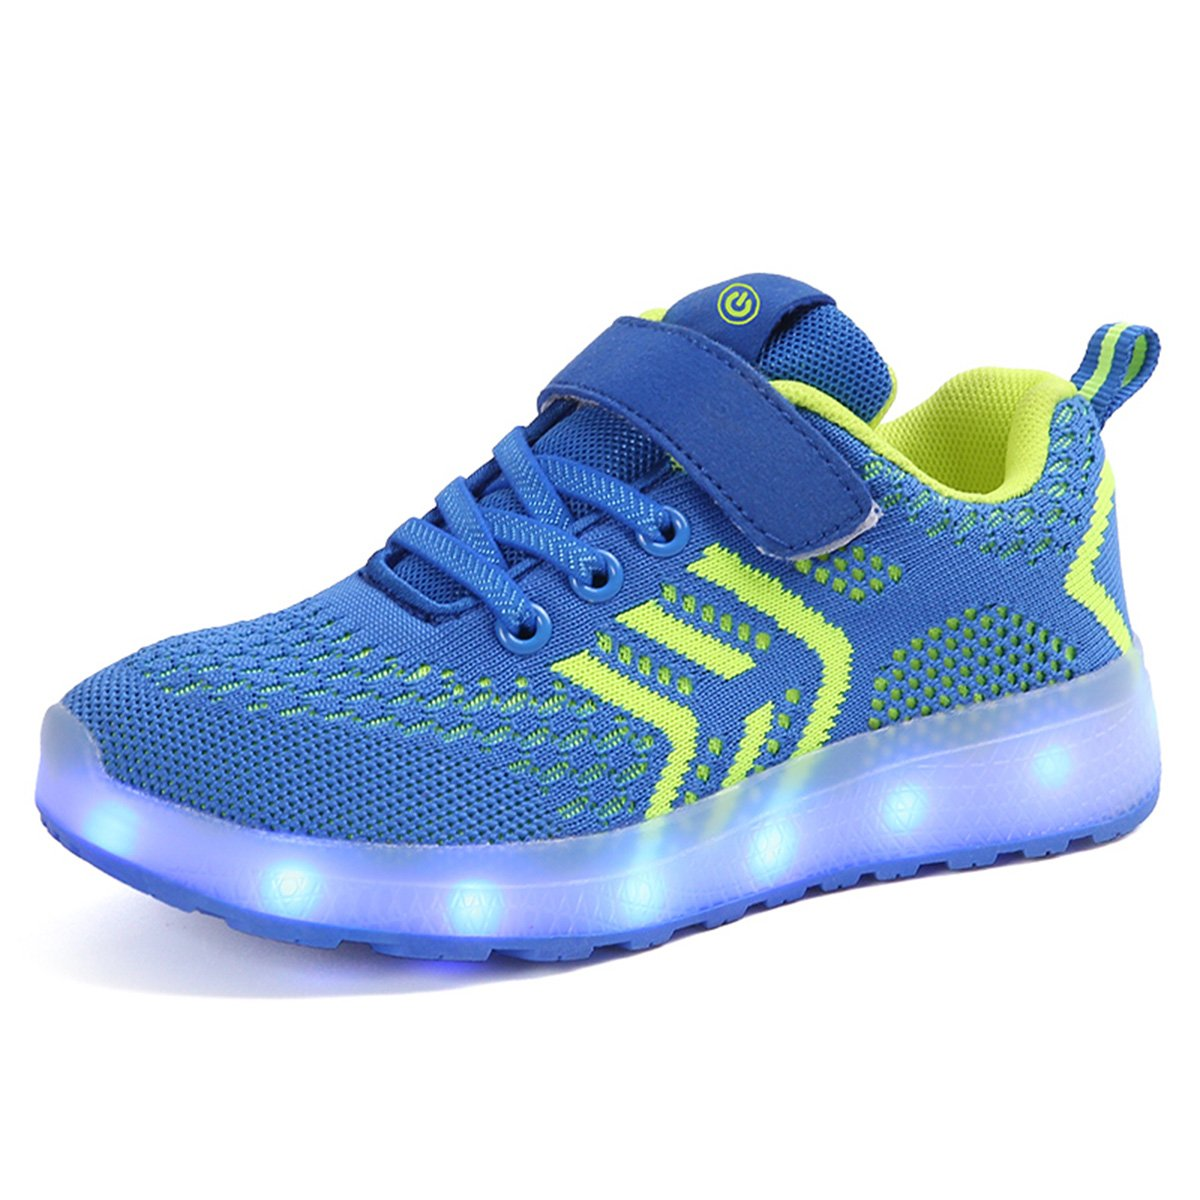 bevoker LED Sportschuhe für Kinder USB Aufladen Blinkschuhe Mädchen Jungen Sneakers UK-LED-STG